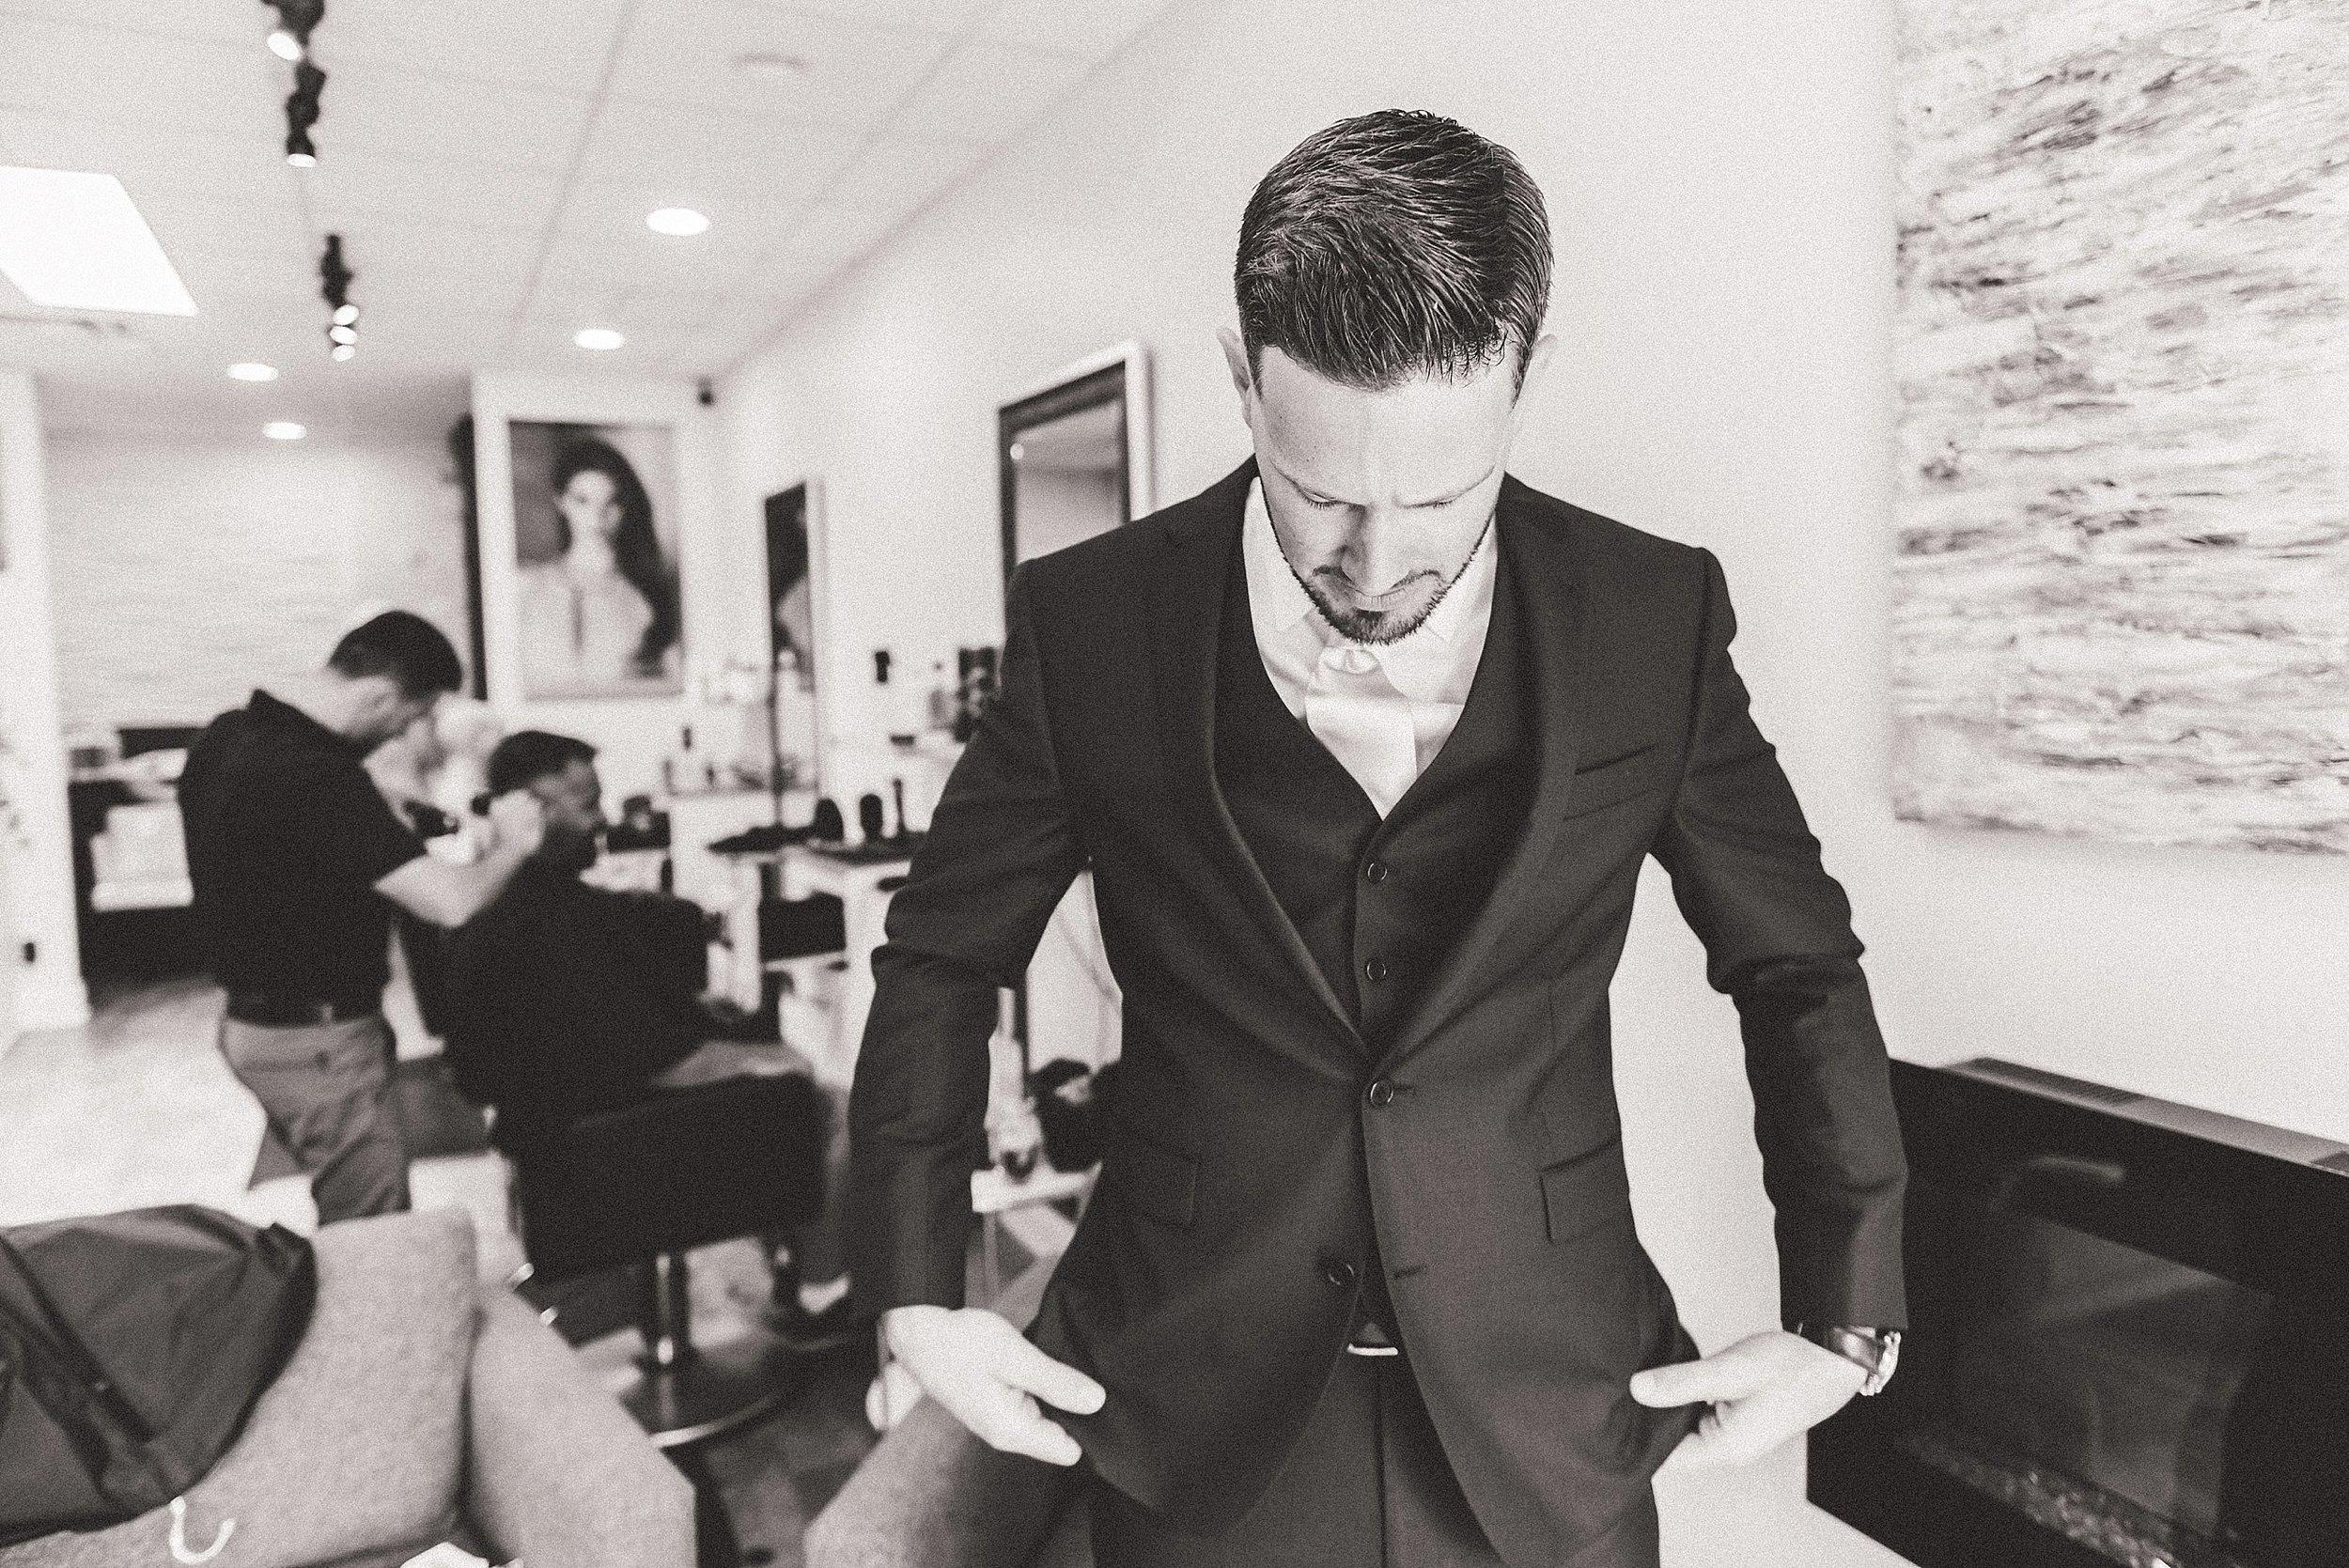 light airy indie fine art ottawa wedding photographer | Ali and Batoul Photography_0146.jpg